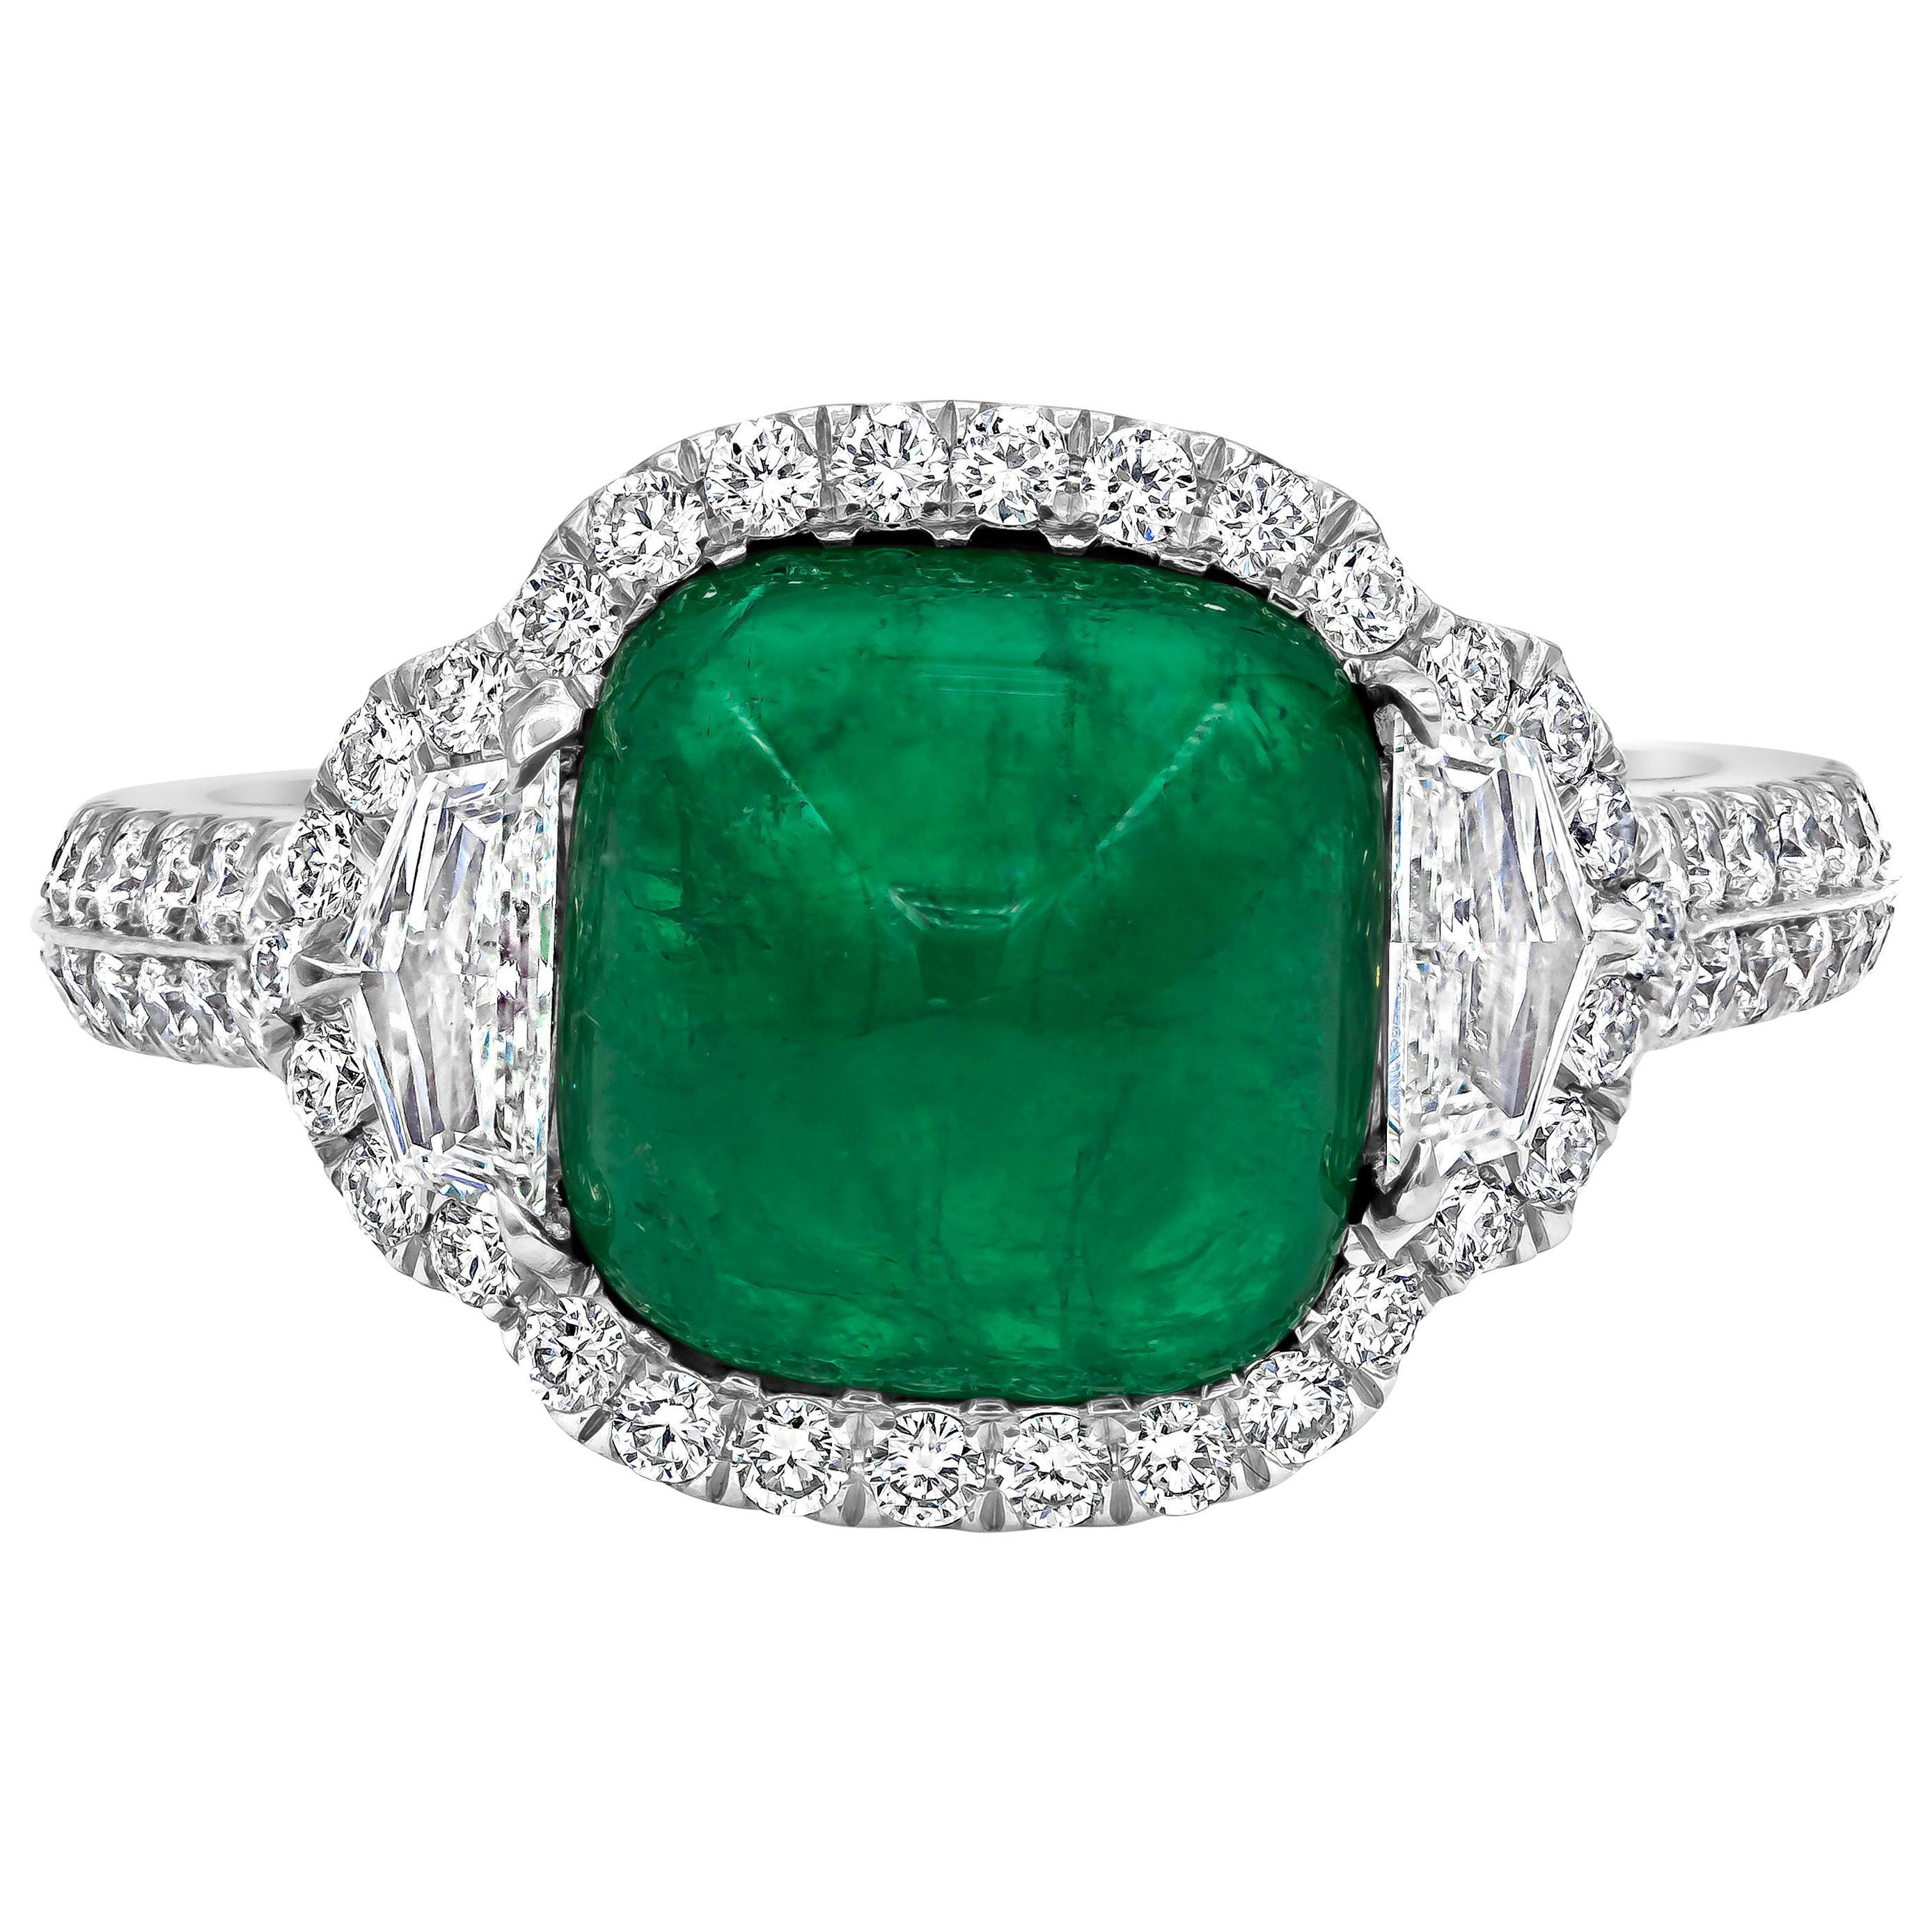 3.42 Carat Cabochon Emerald and Diamond Halo Three-Stone Ring